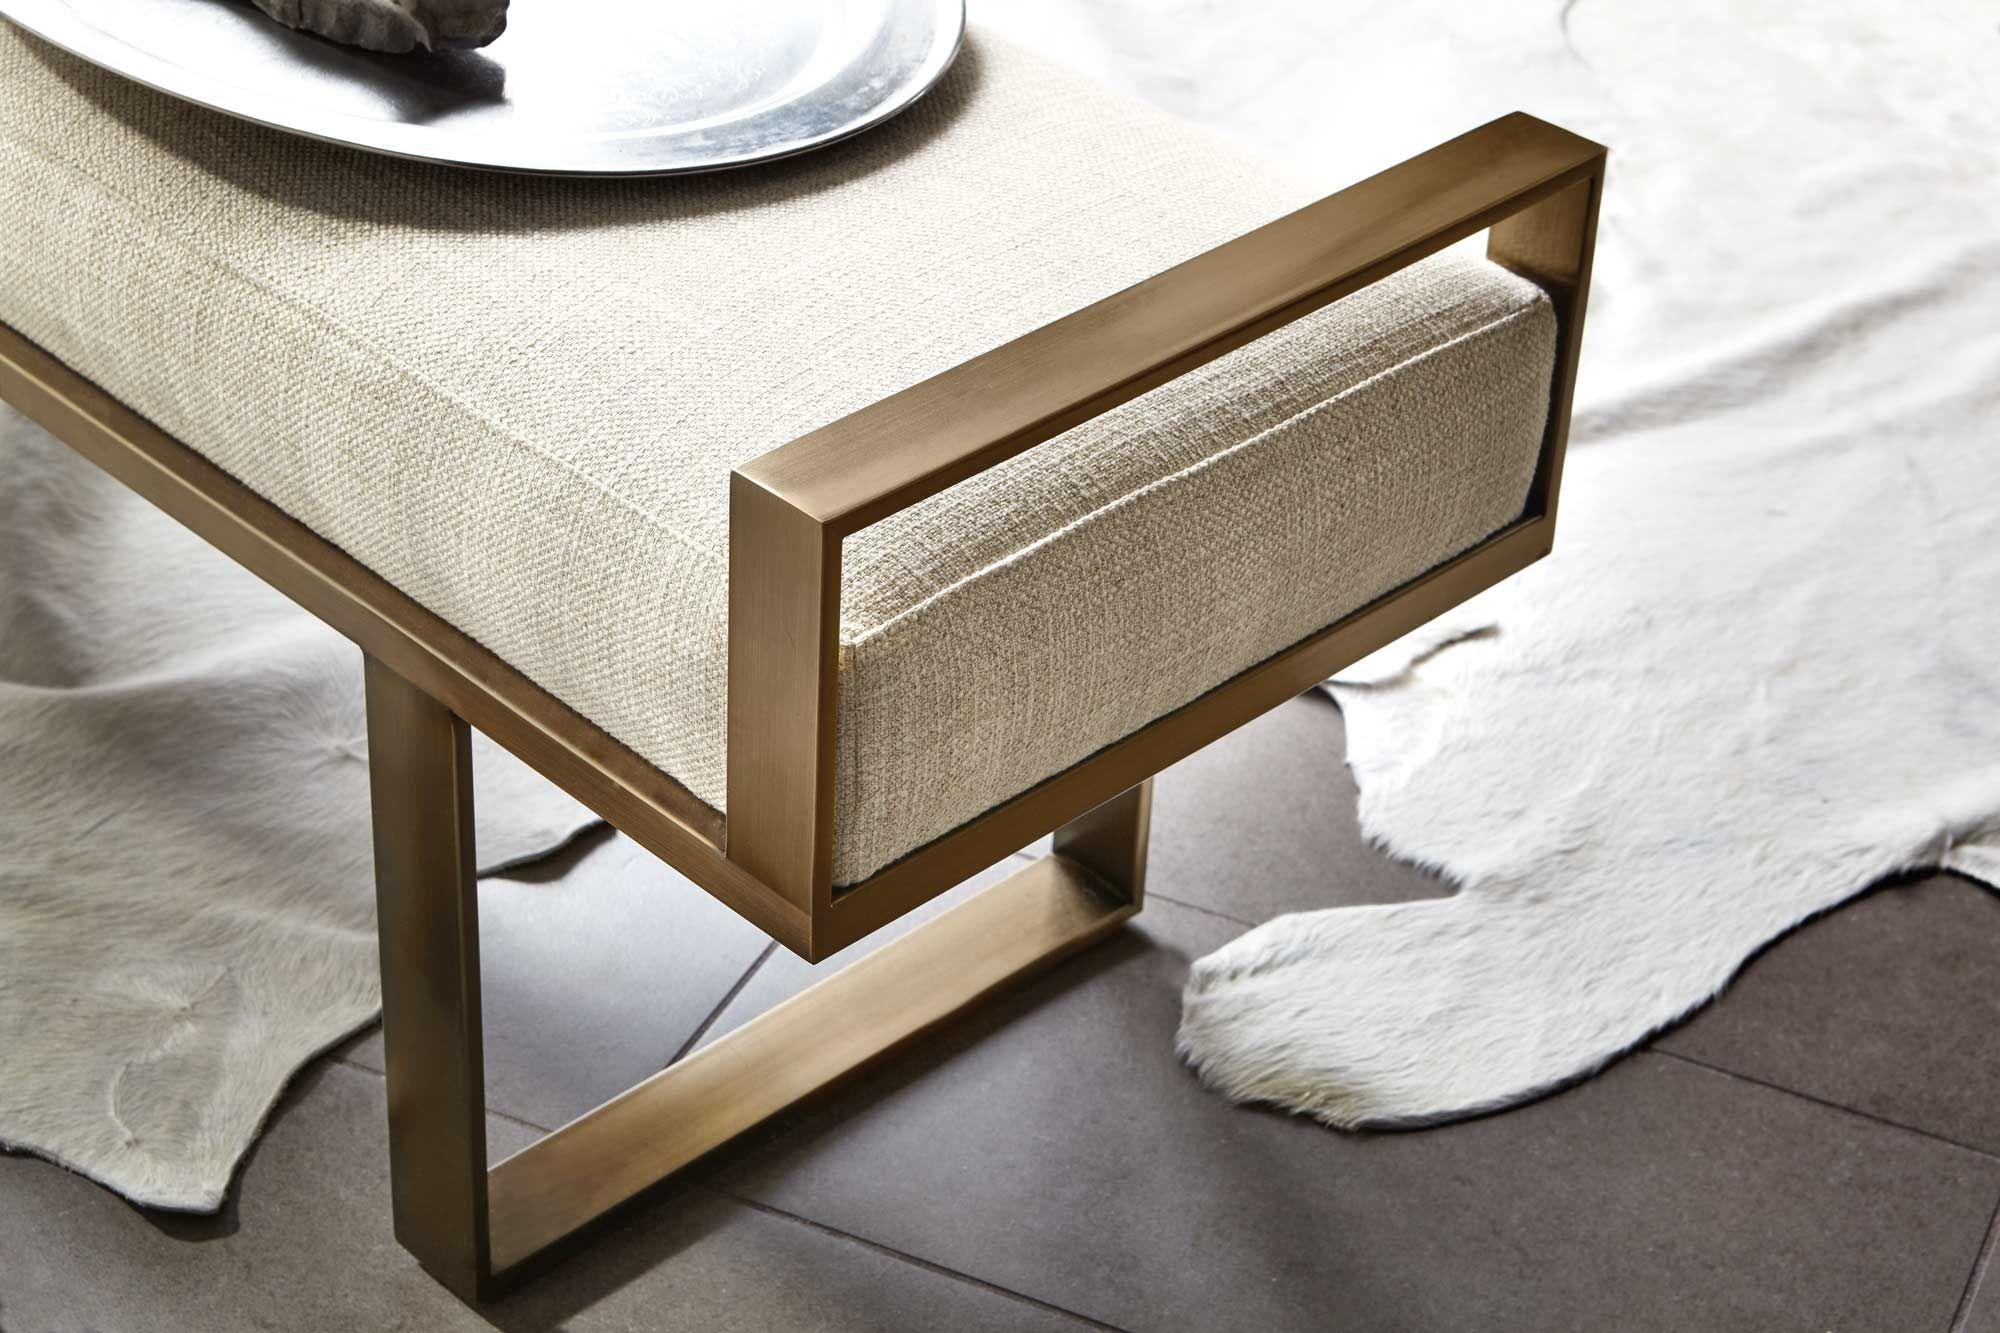 Metal Bench Bernhardt In 2020 Furniture Upholstered